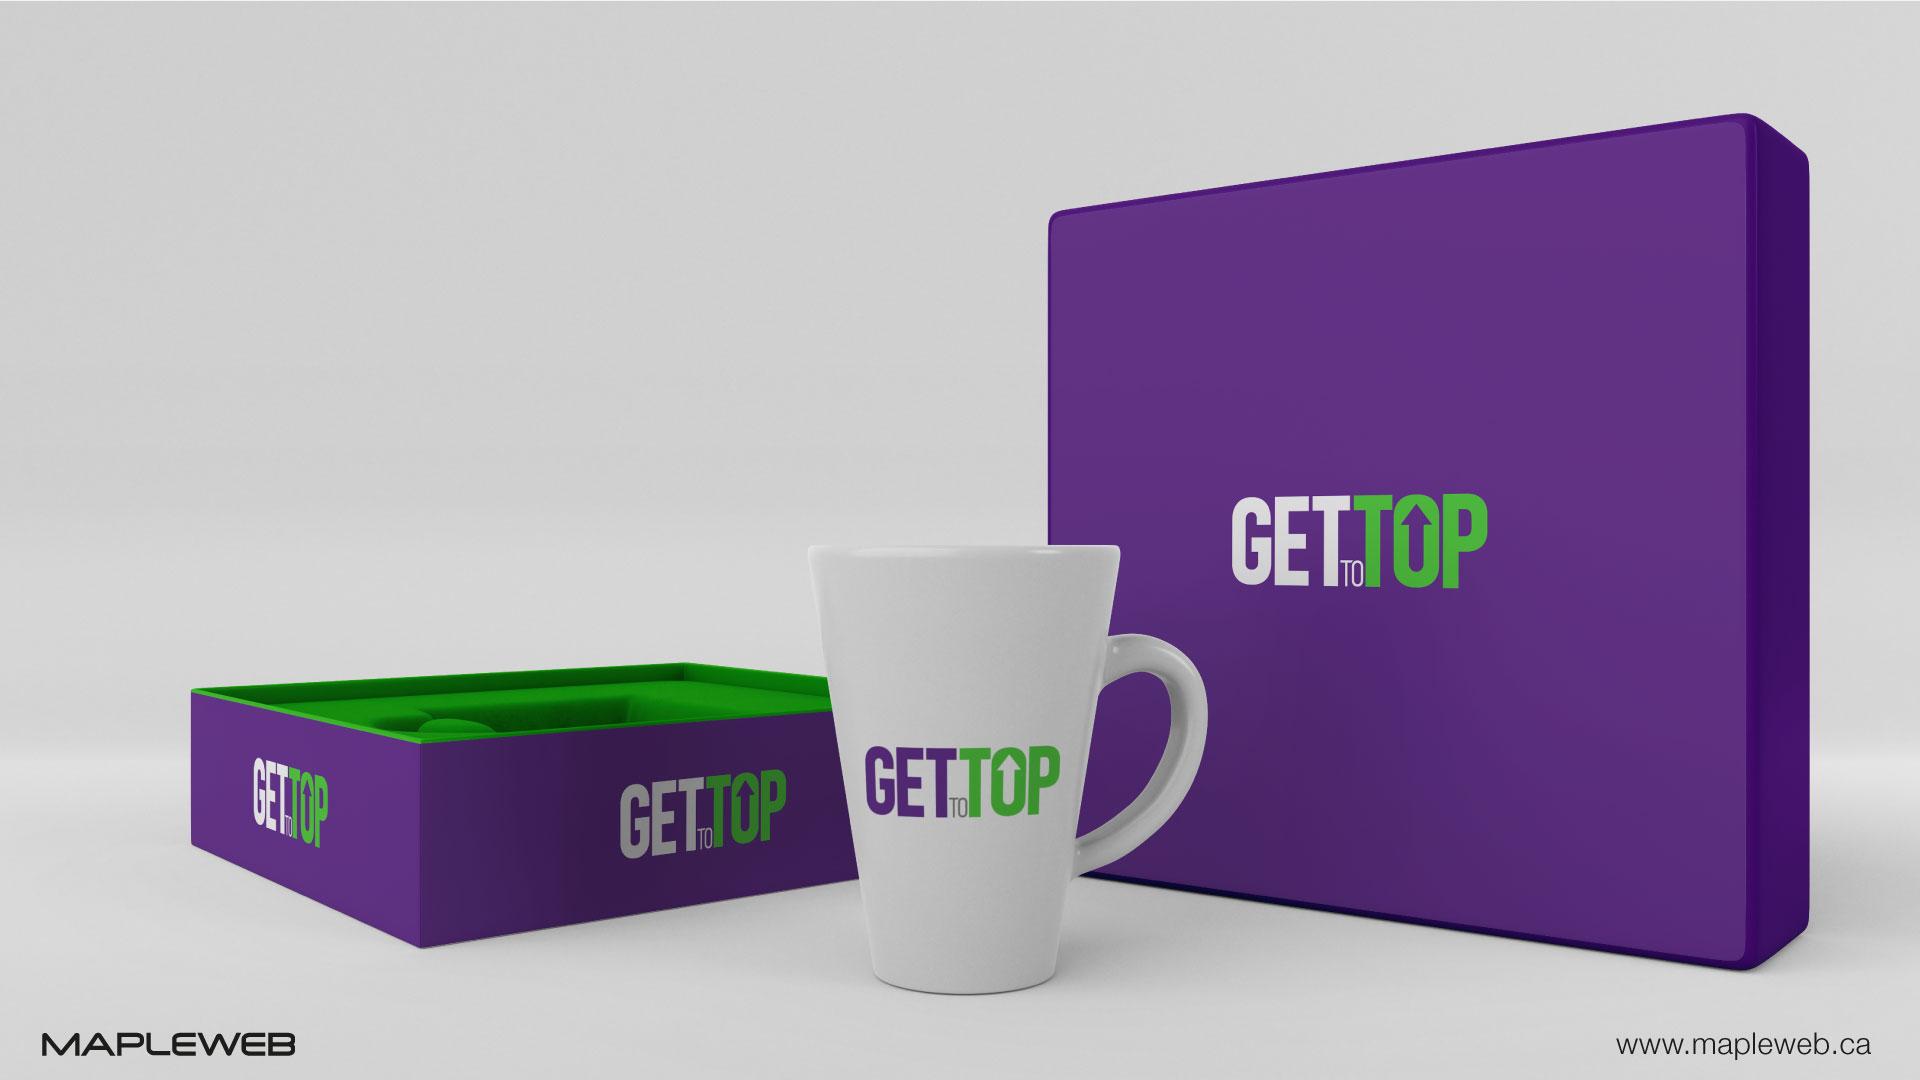 gettotop-brand-logo-design-by-mapleweb-vancouver-canada-mug-white-mock